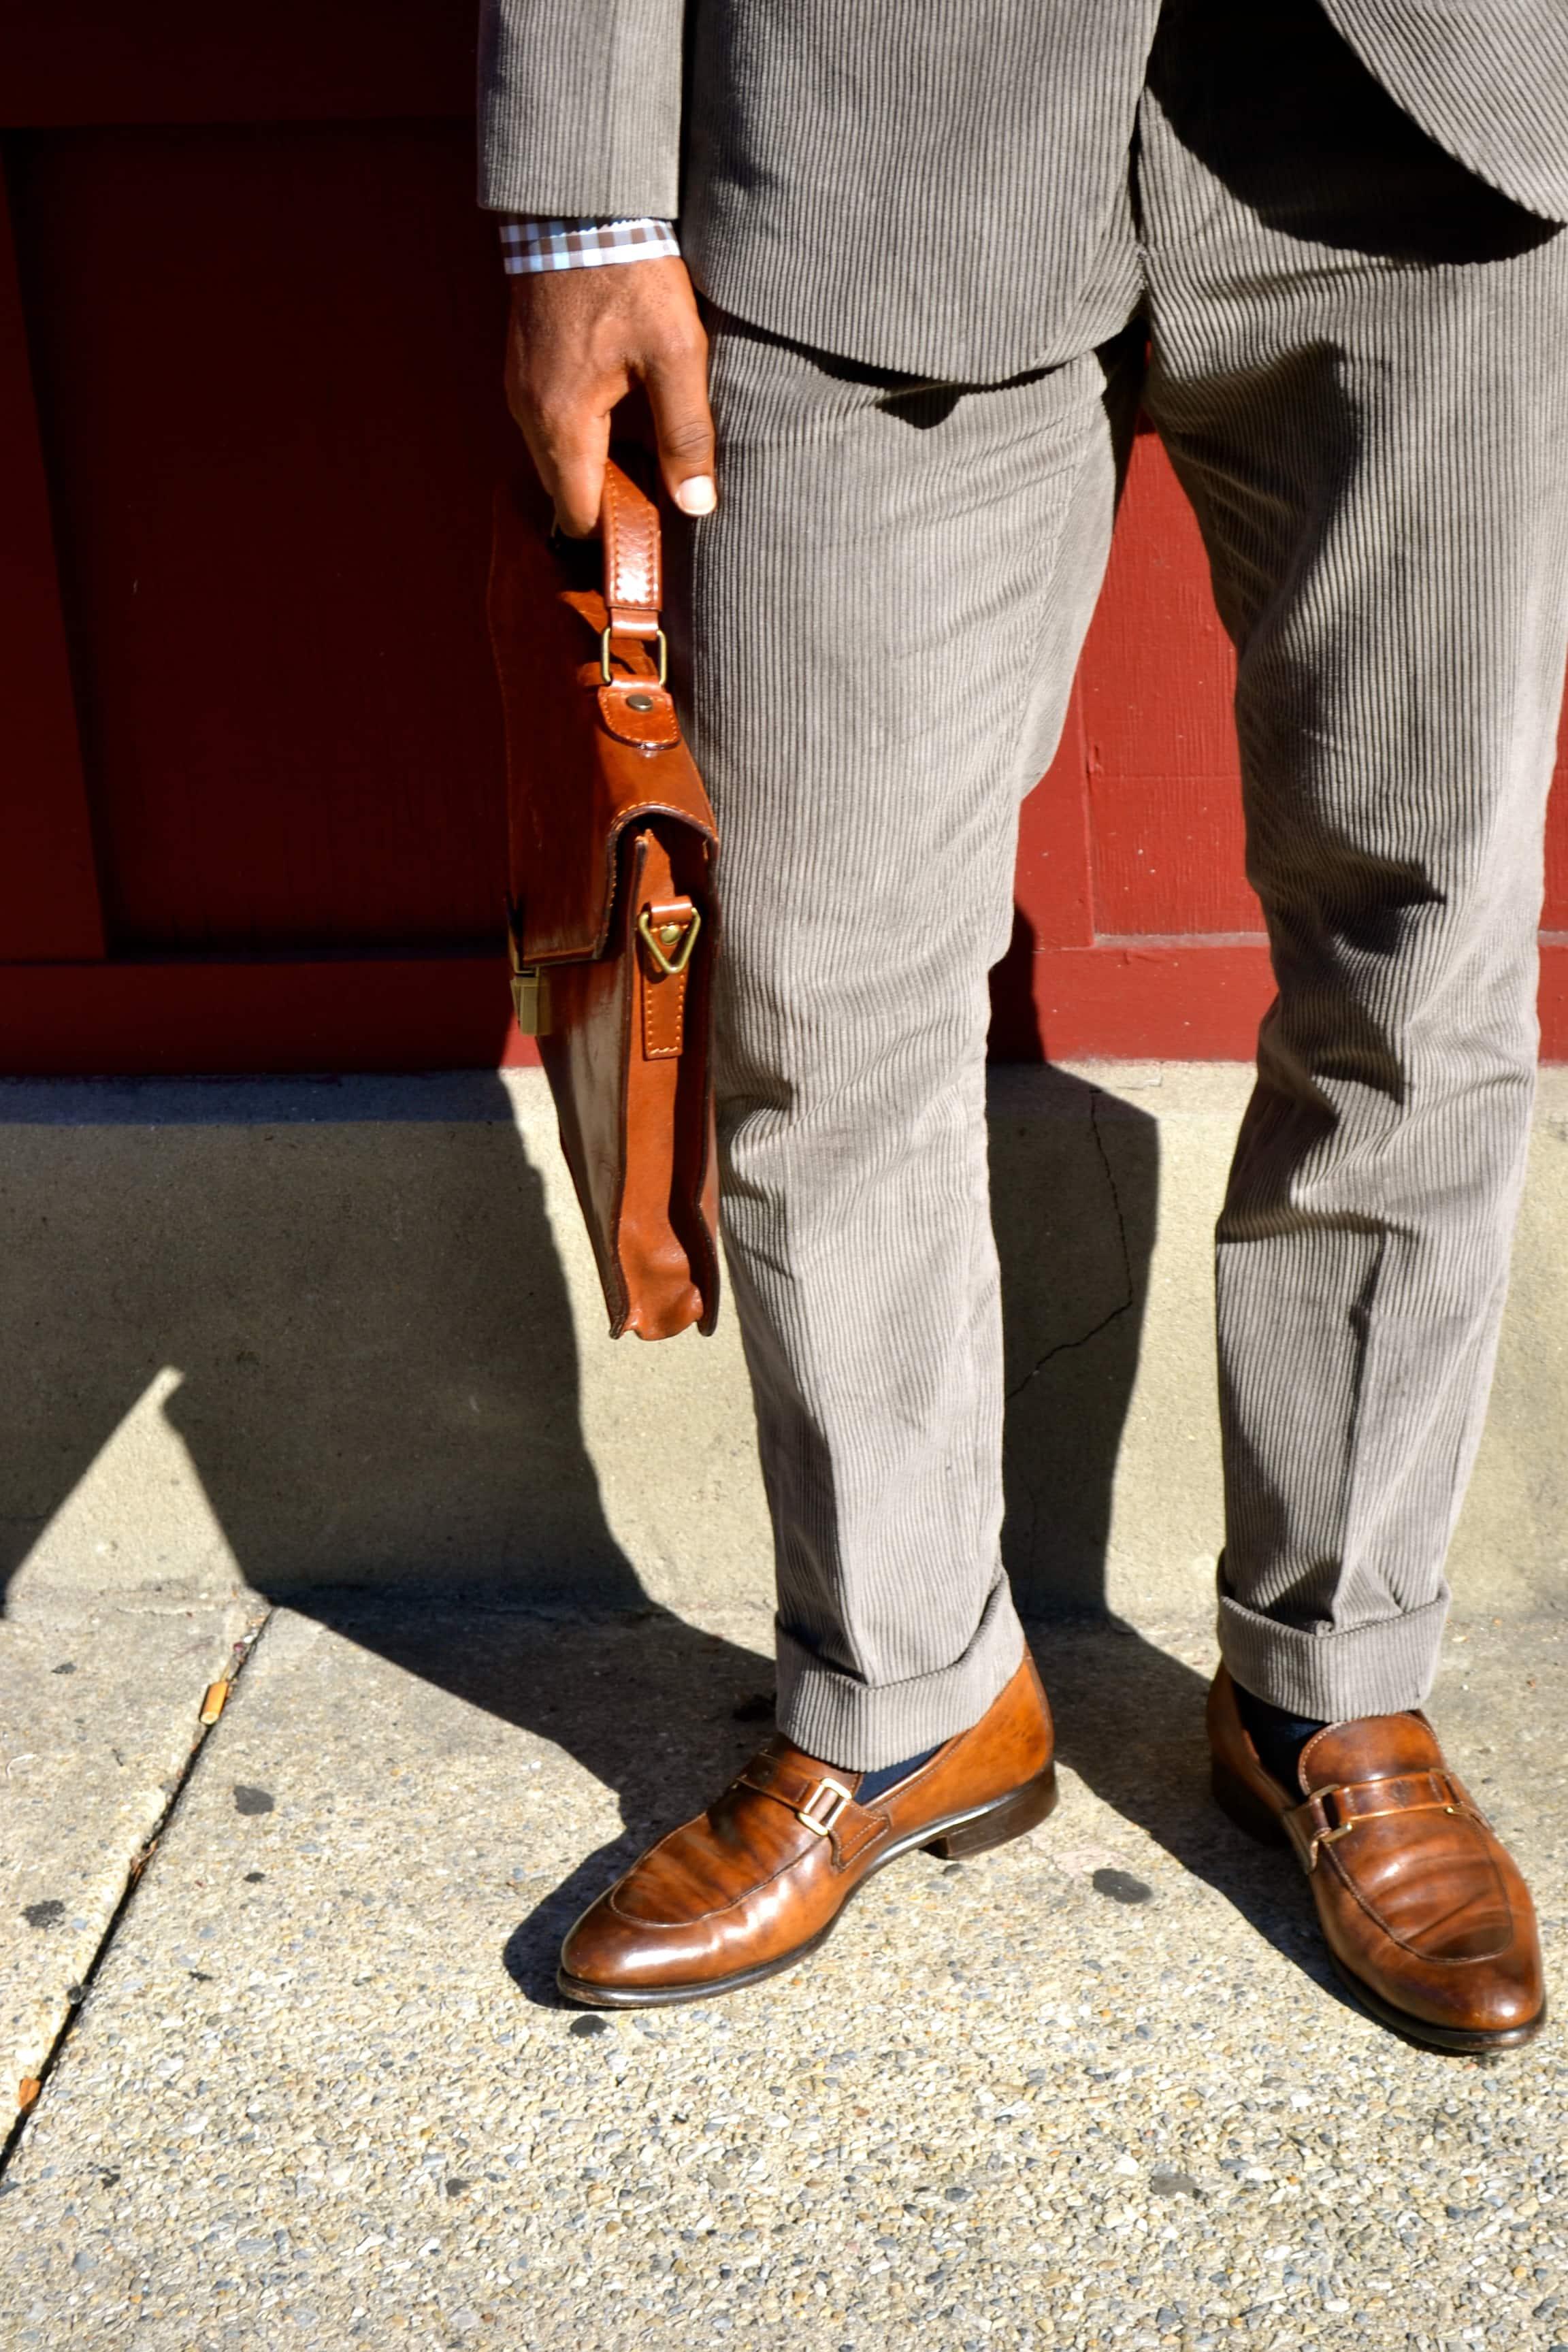 Chris Bosh Mr. Nice Tie & Armstrong & wilson Review